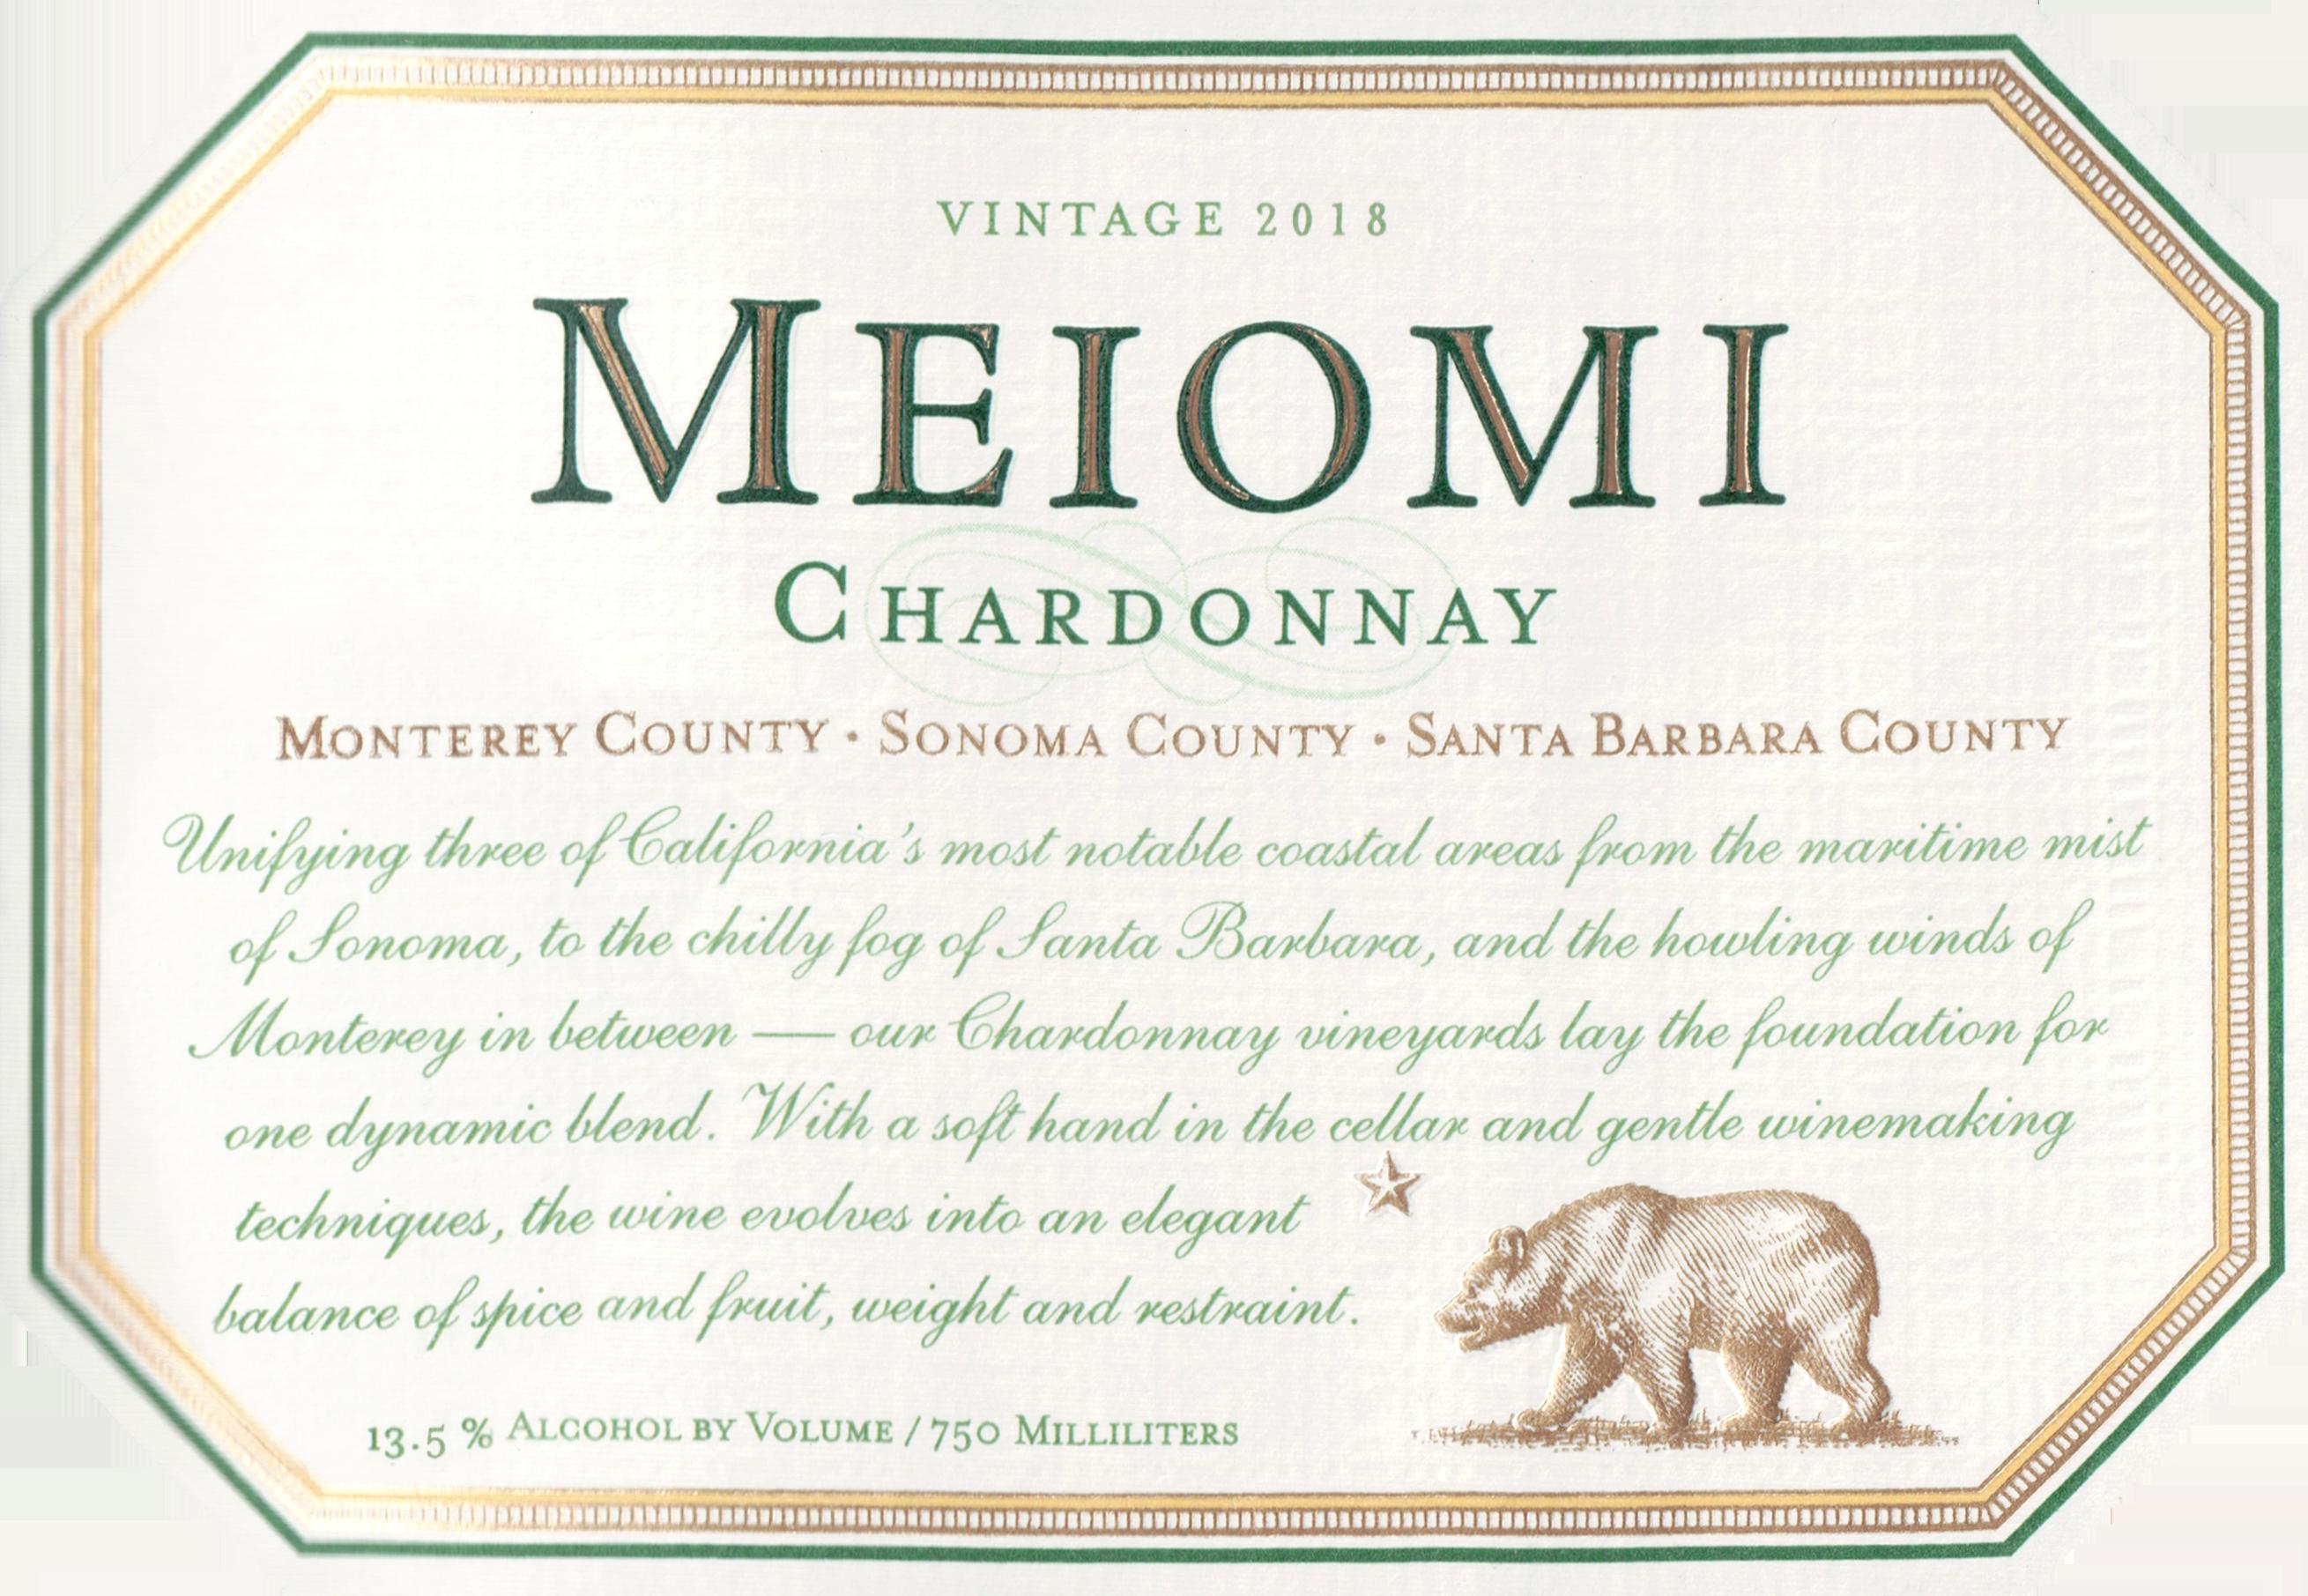 Meiomi Chardonnay 2018